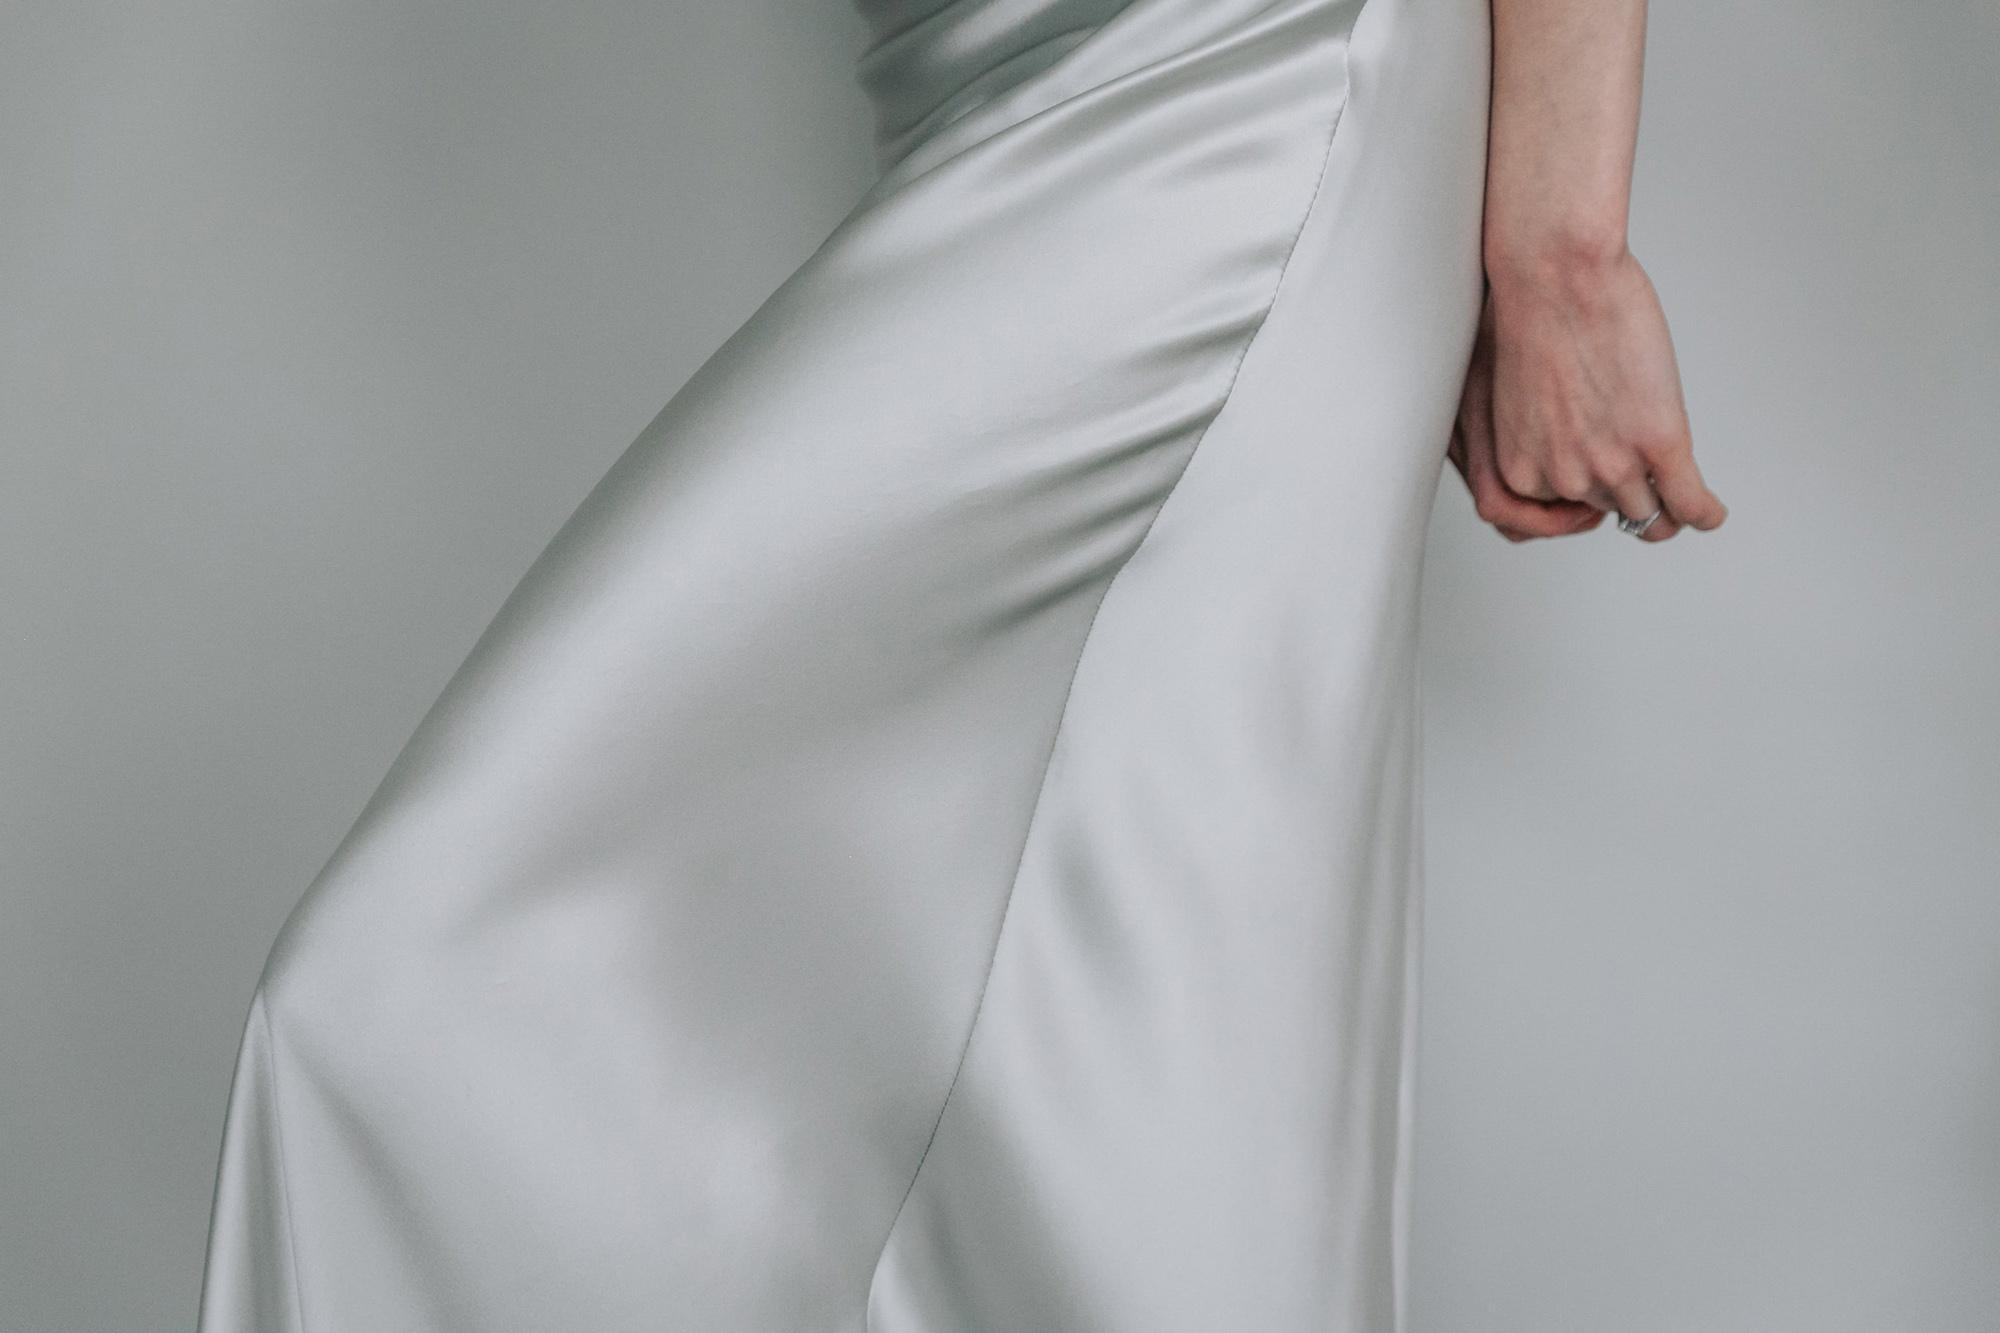 Kate-Beaumont-Sheffield-Cosmos-Minimal-Modern-Silver-Silk-Slip-Wedding-Dress-7.jpg